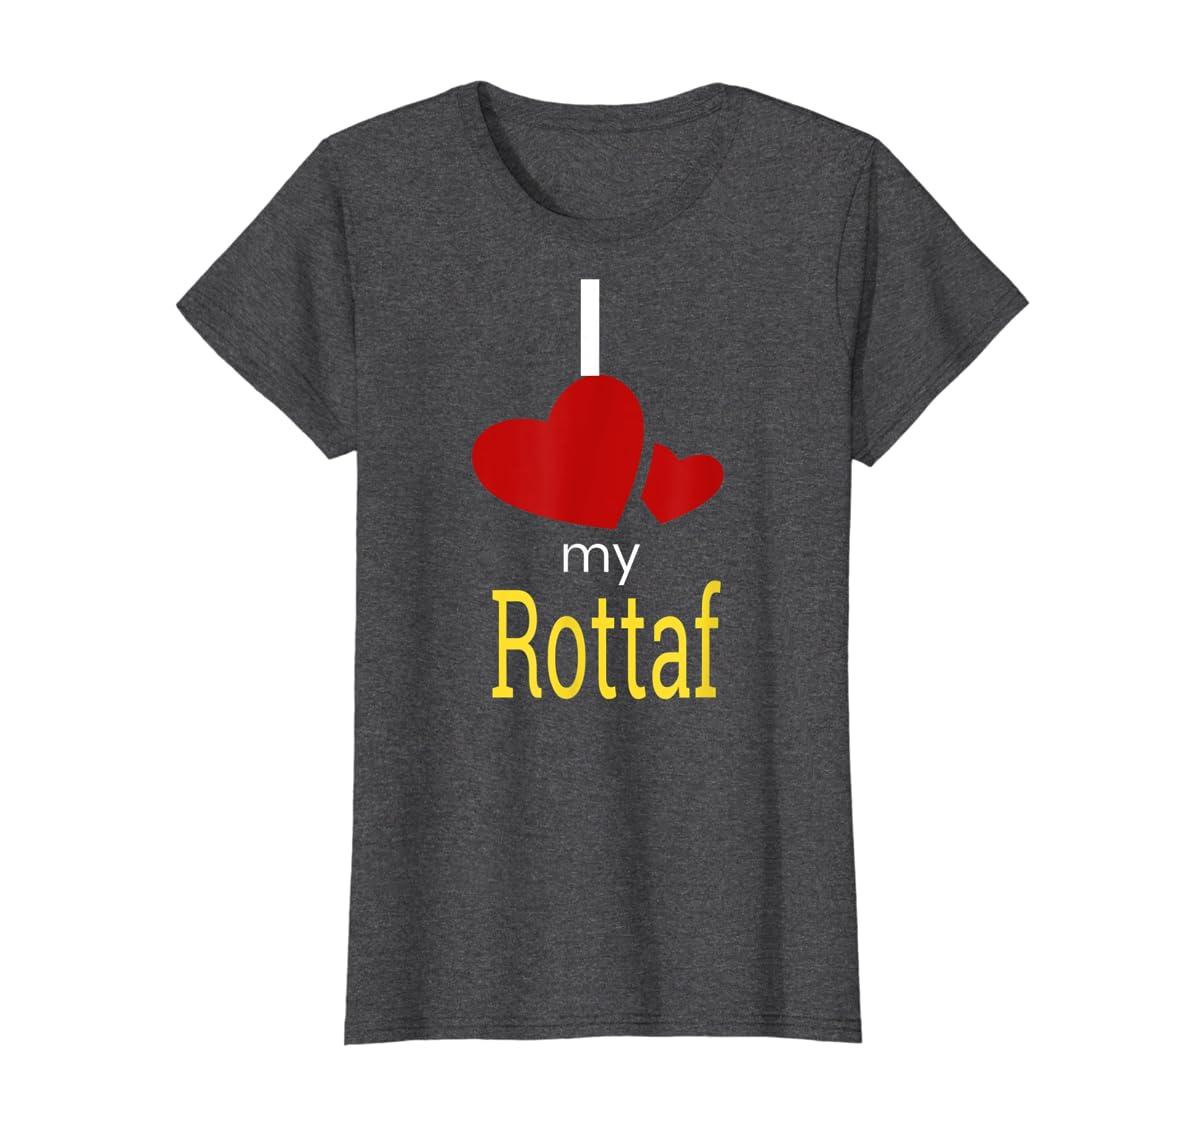 Rottaf Dog Shirt Love Rottweiler + Afghan Hound =  T-Shirt-Women's T-Shirt-Dark Heather